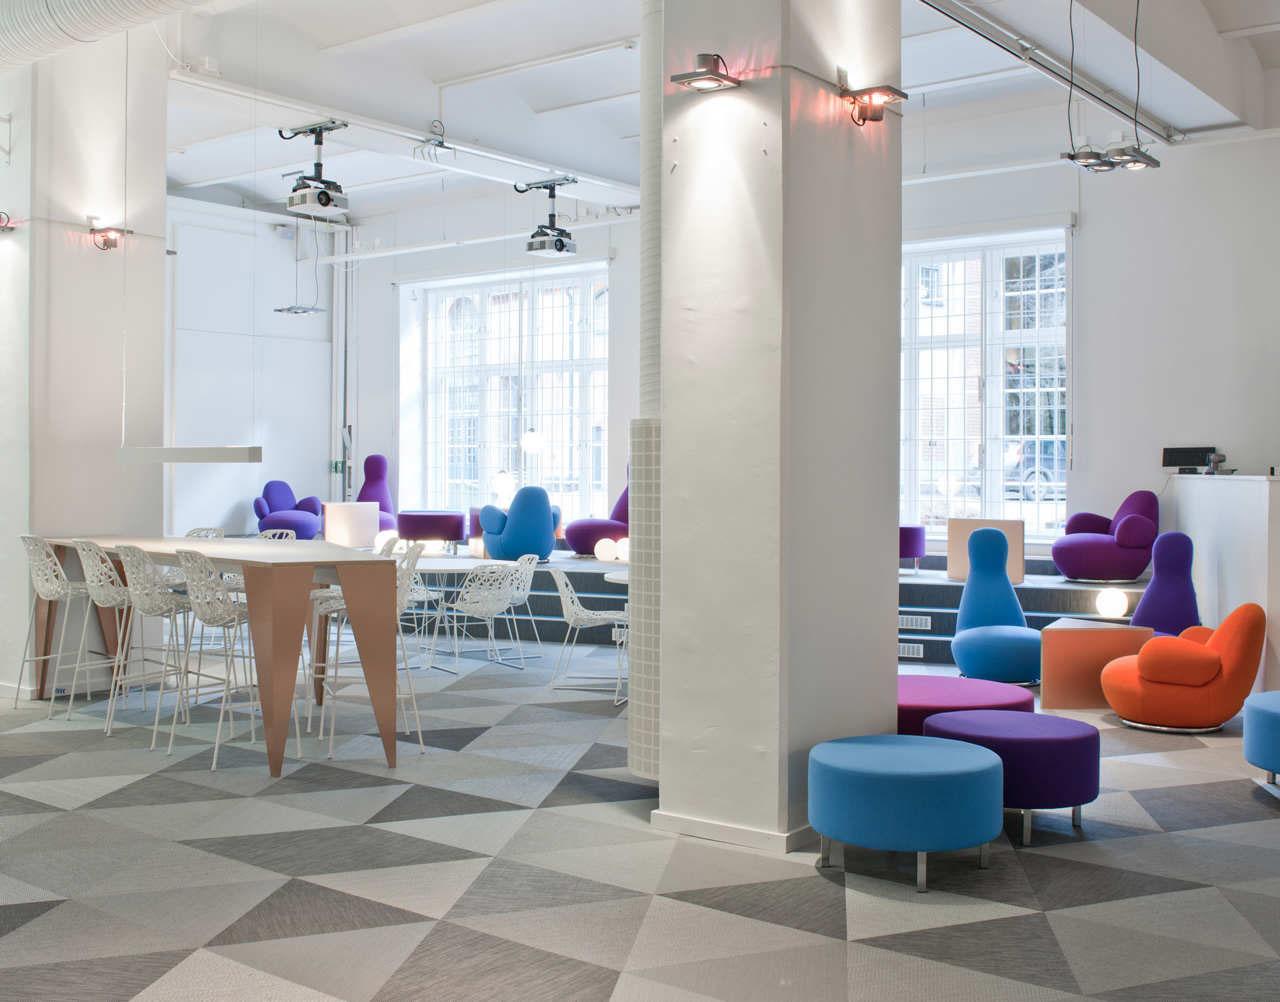 Skype office interior design in stockholm